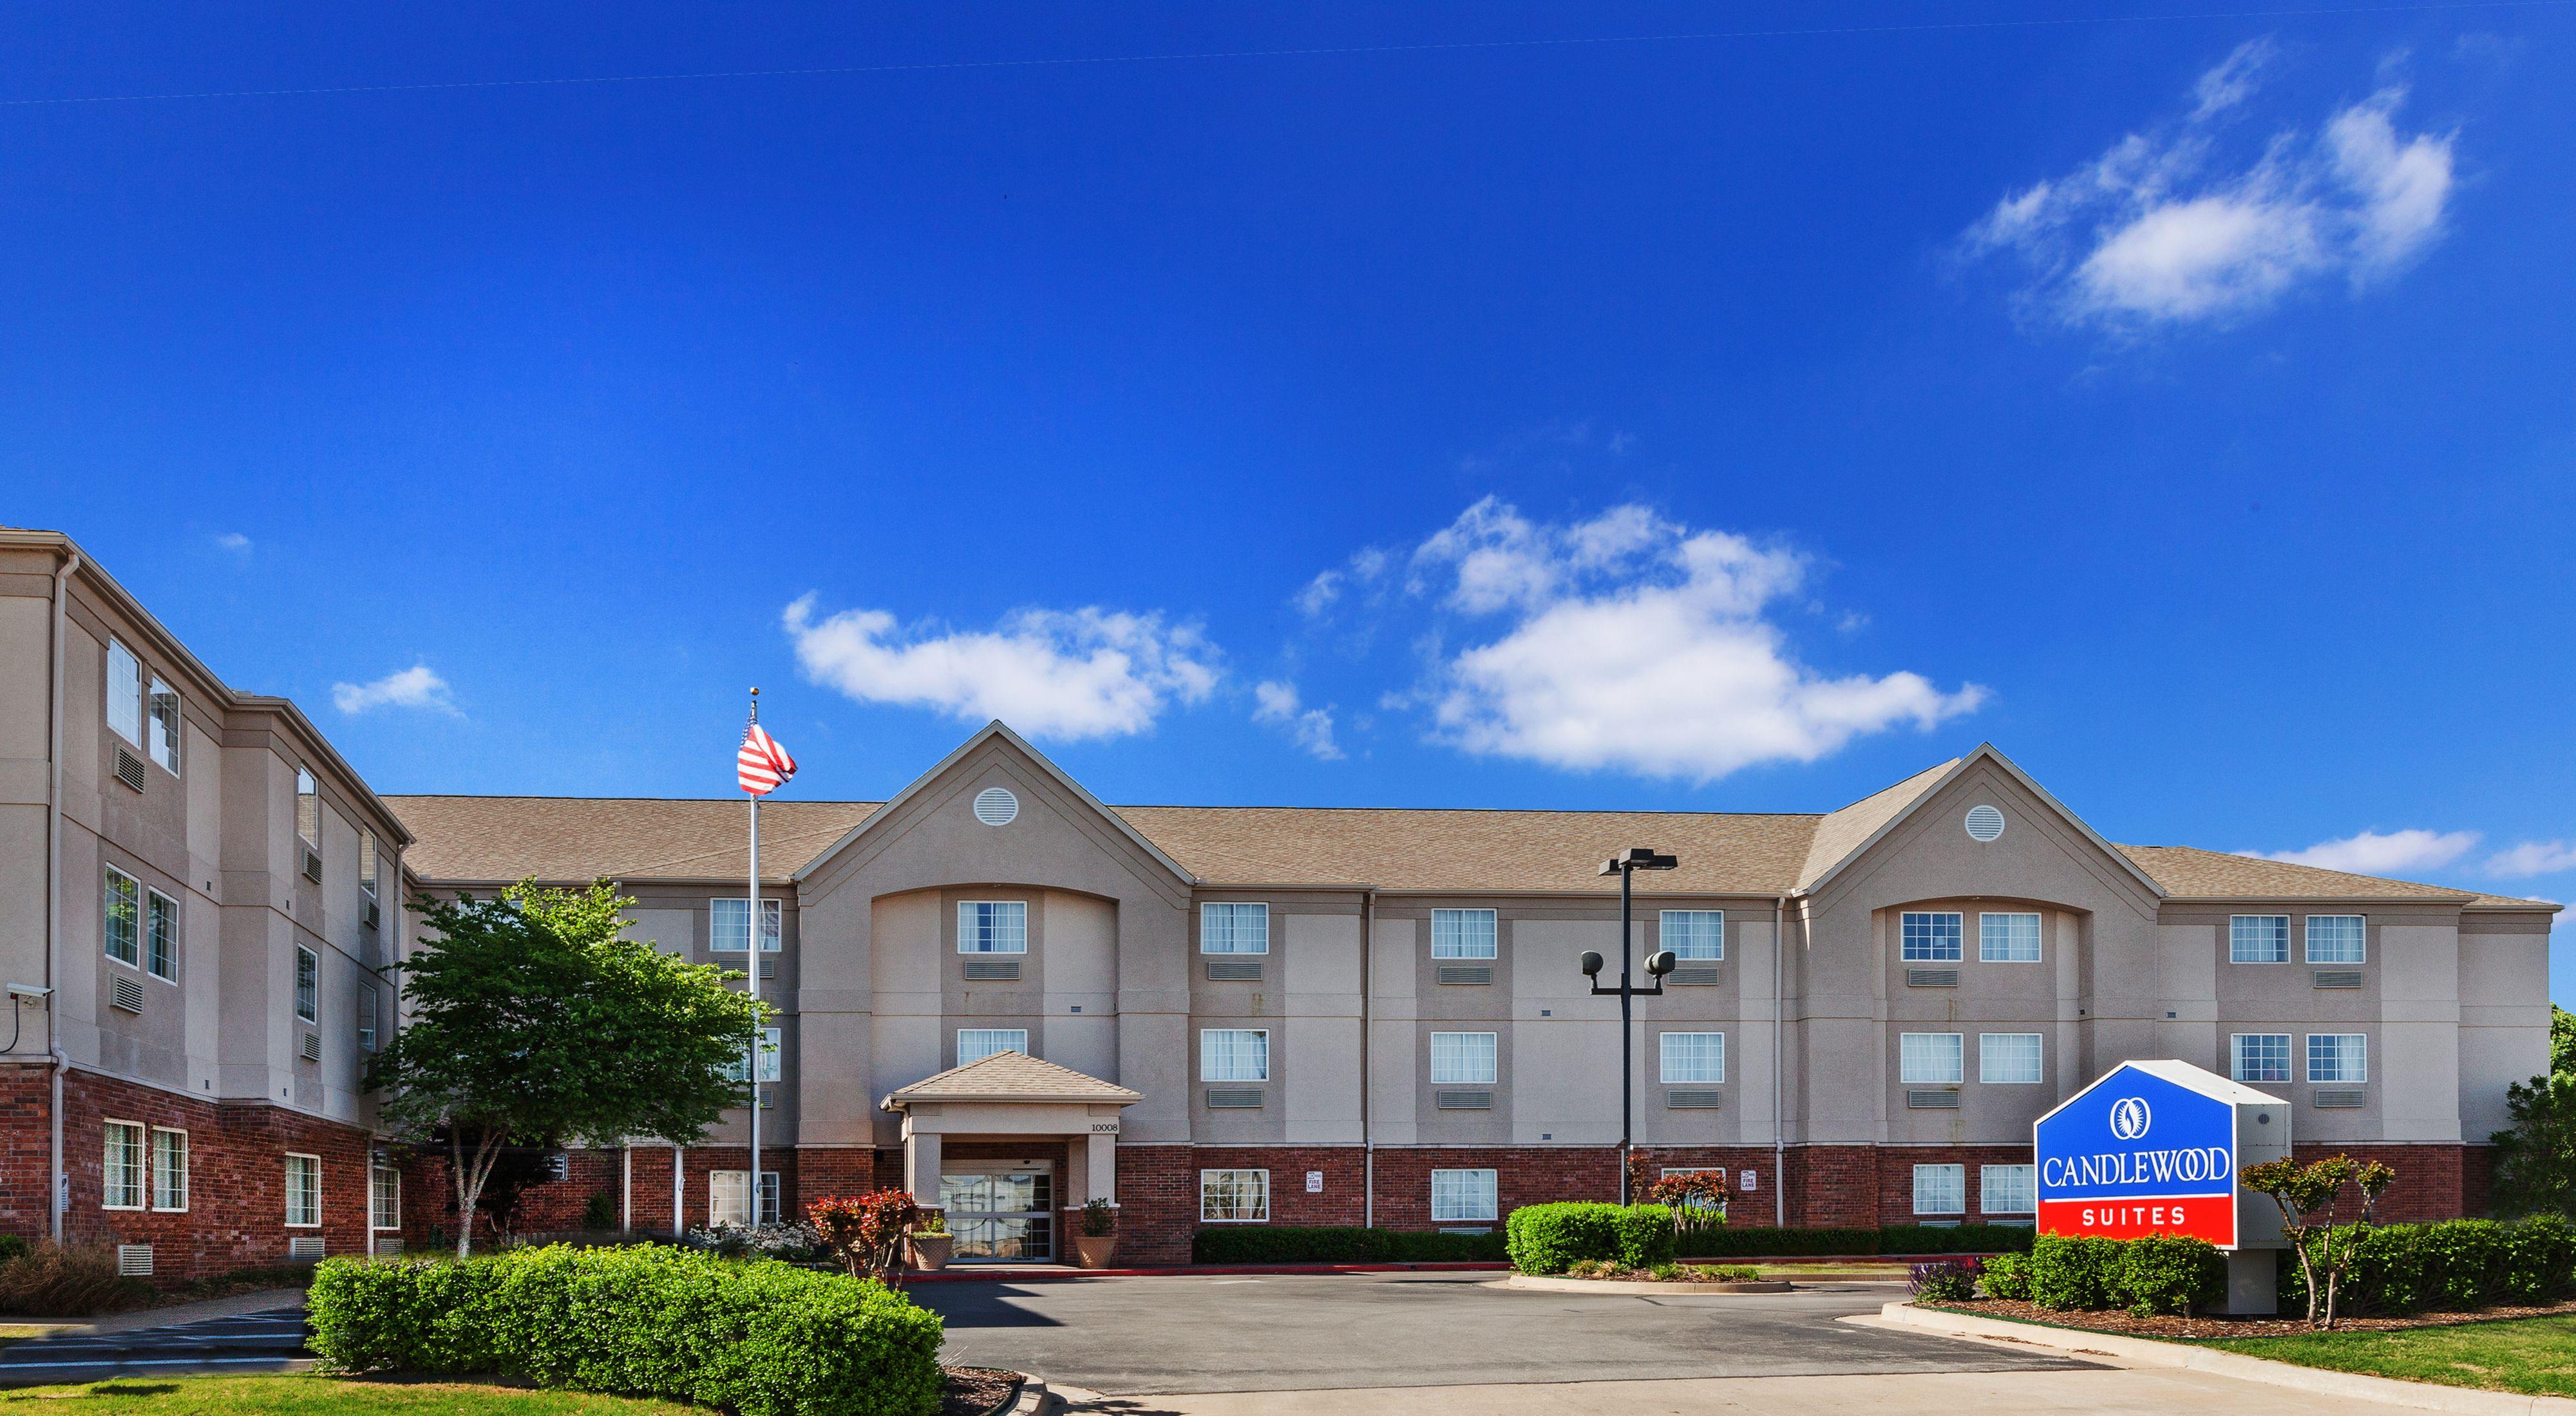 Candlewood Suites Terre Haute image 5